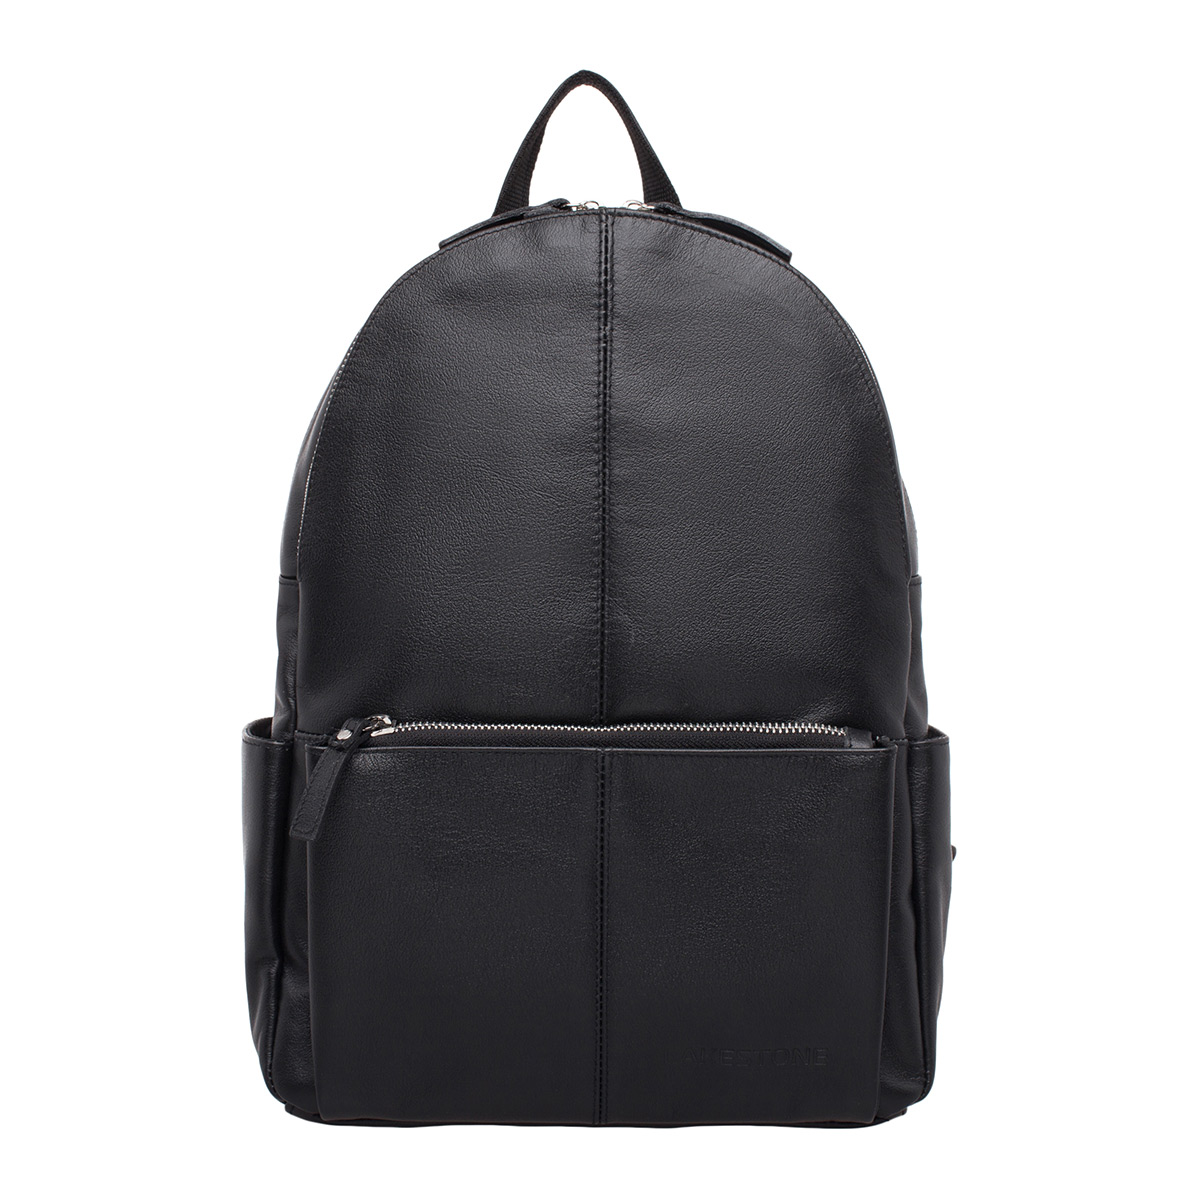 Женский рюкзак Belfry Black фото